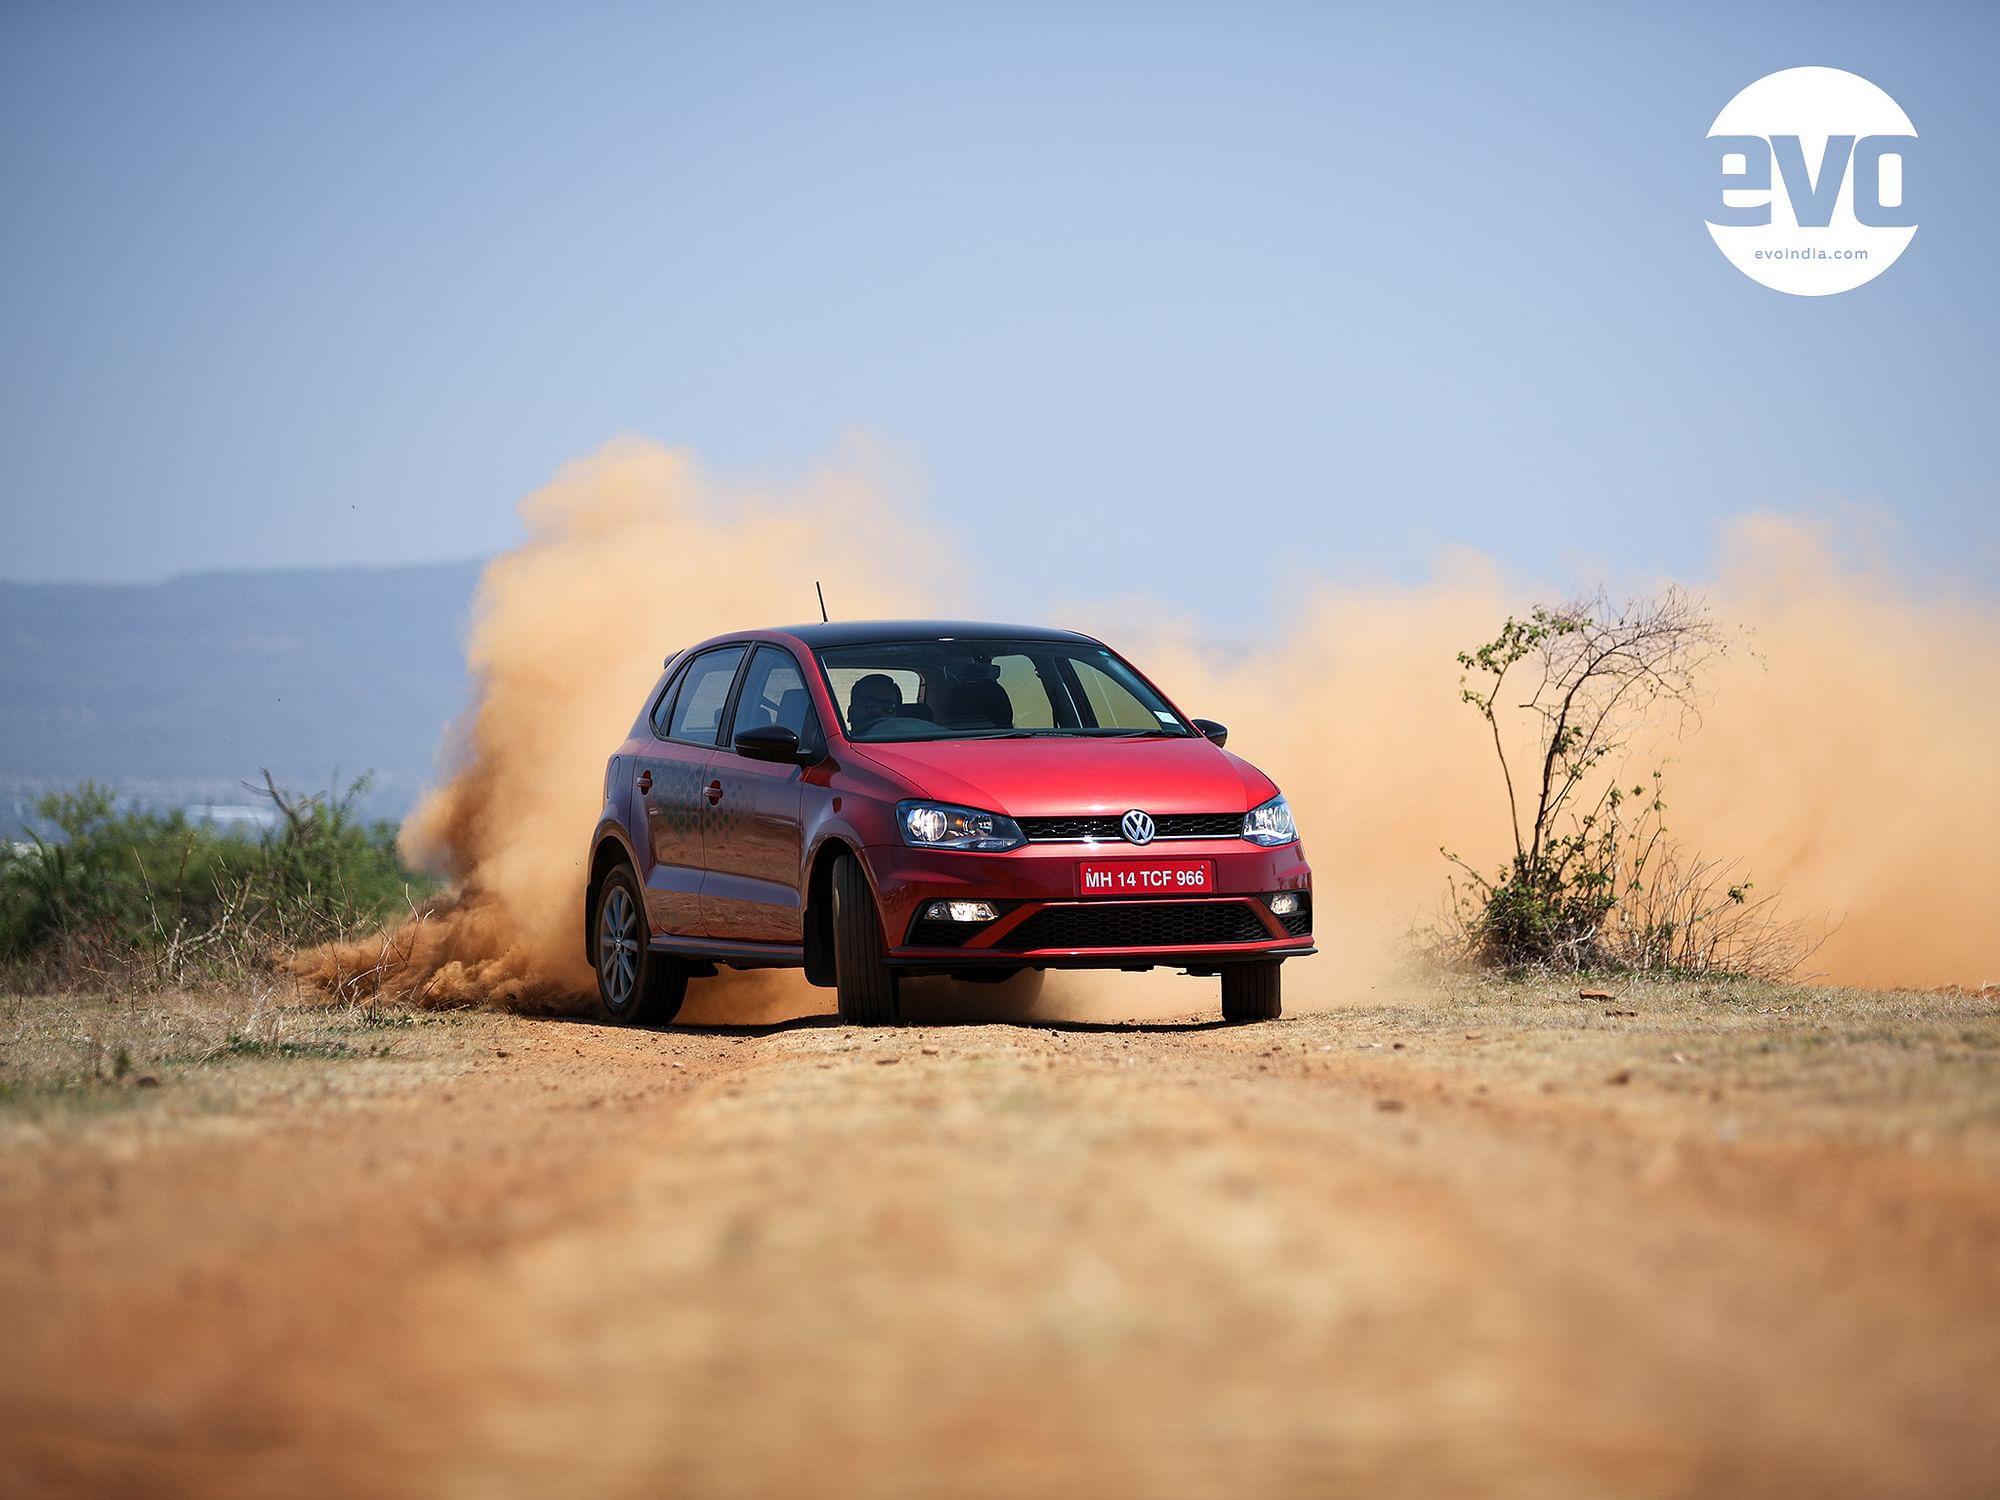 Volkswagen Polo 1 0 Tsi Review Evo India